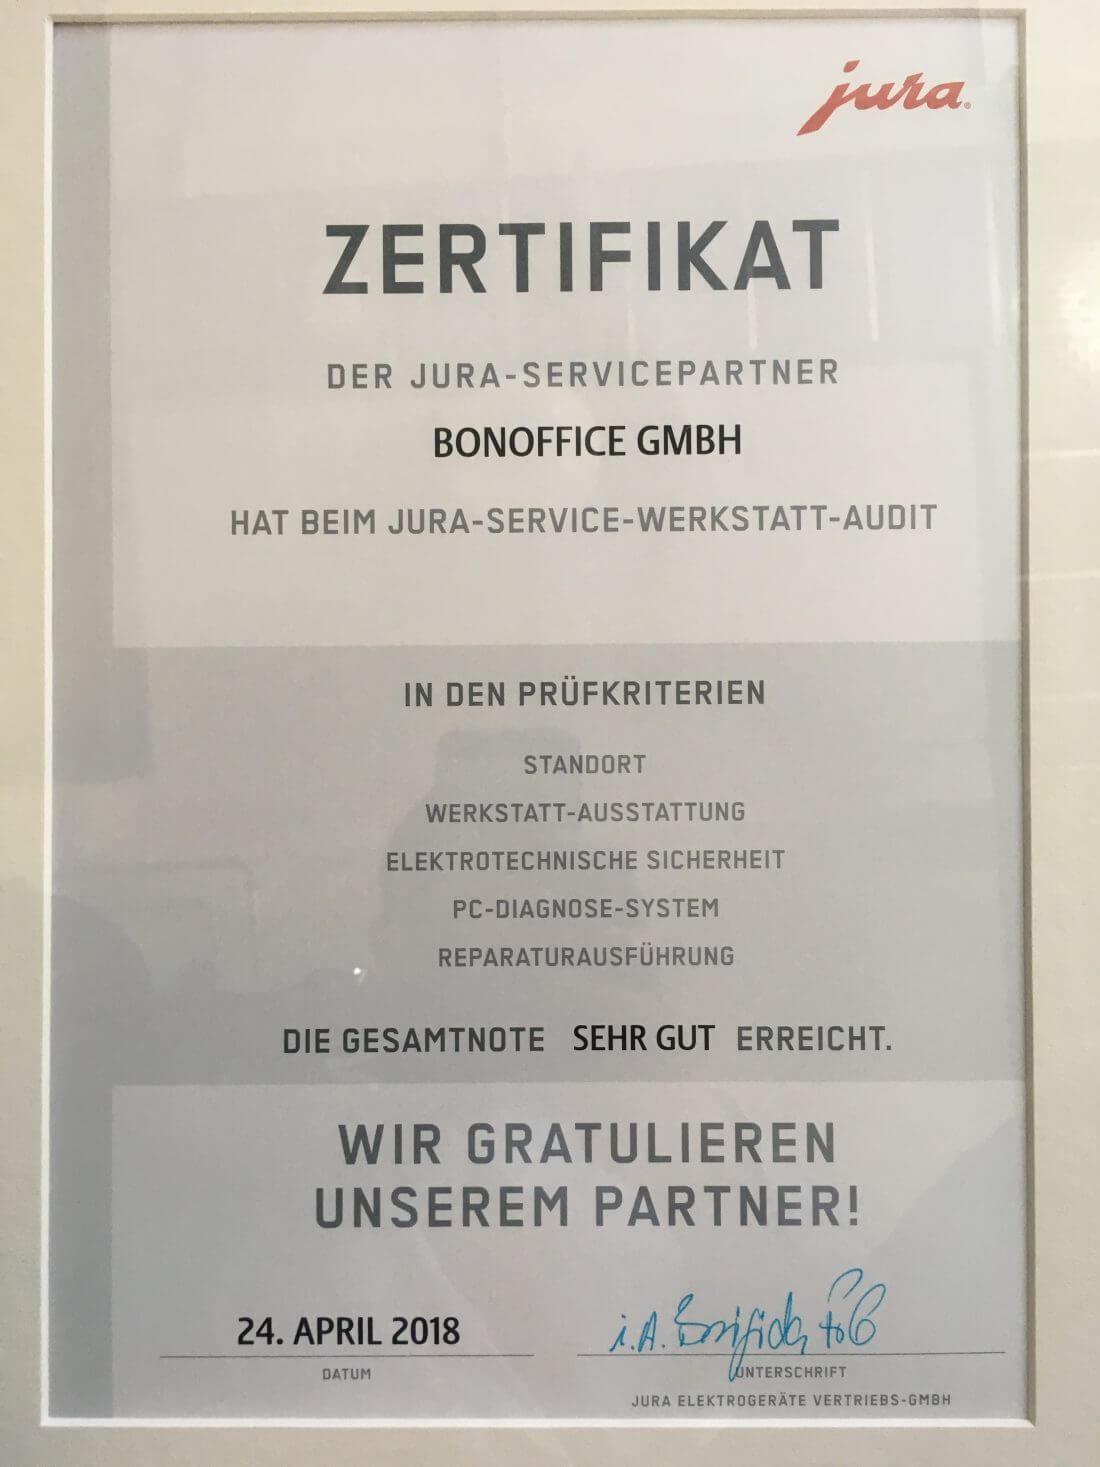 JURA Zertifikat